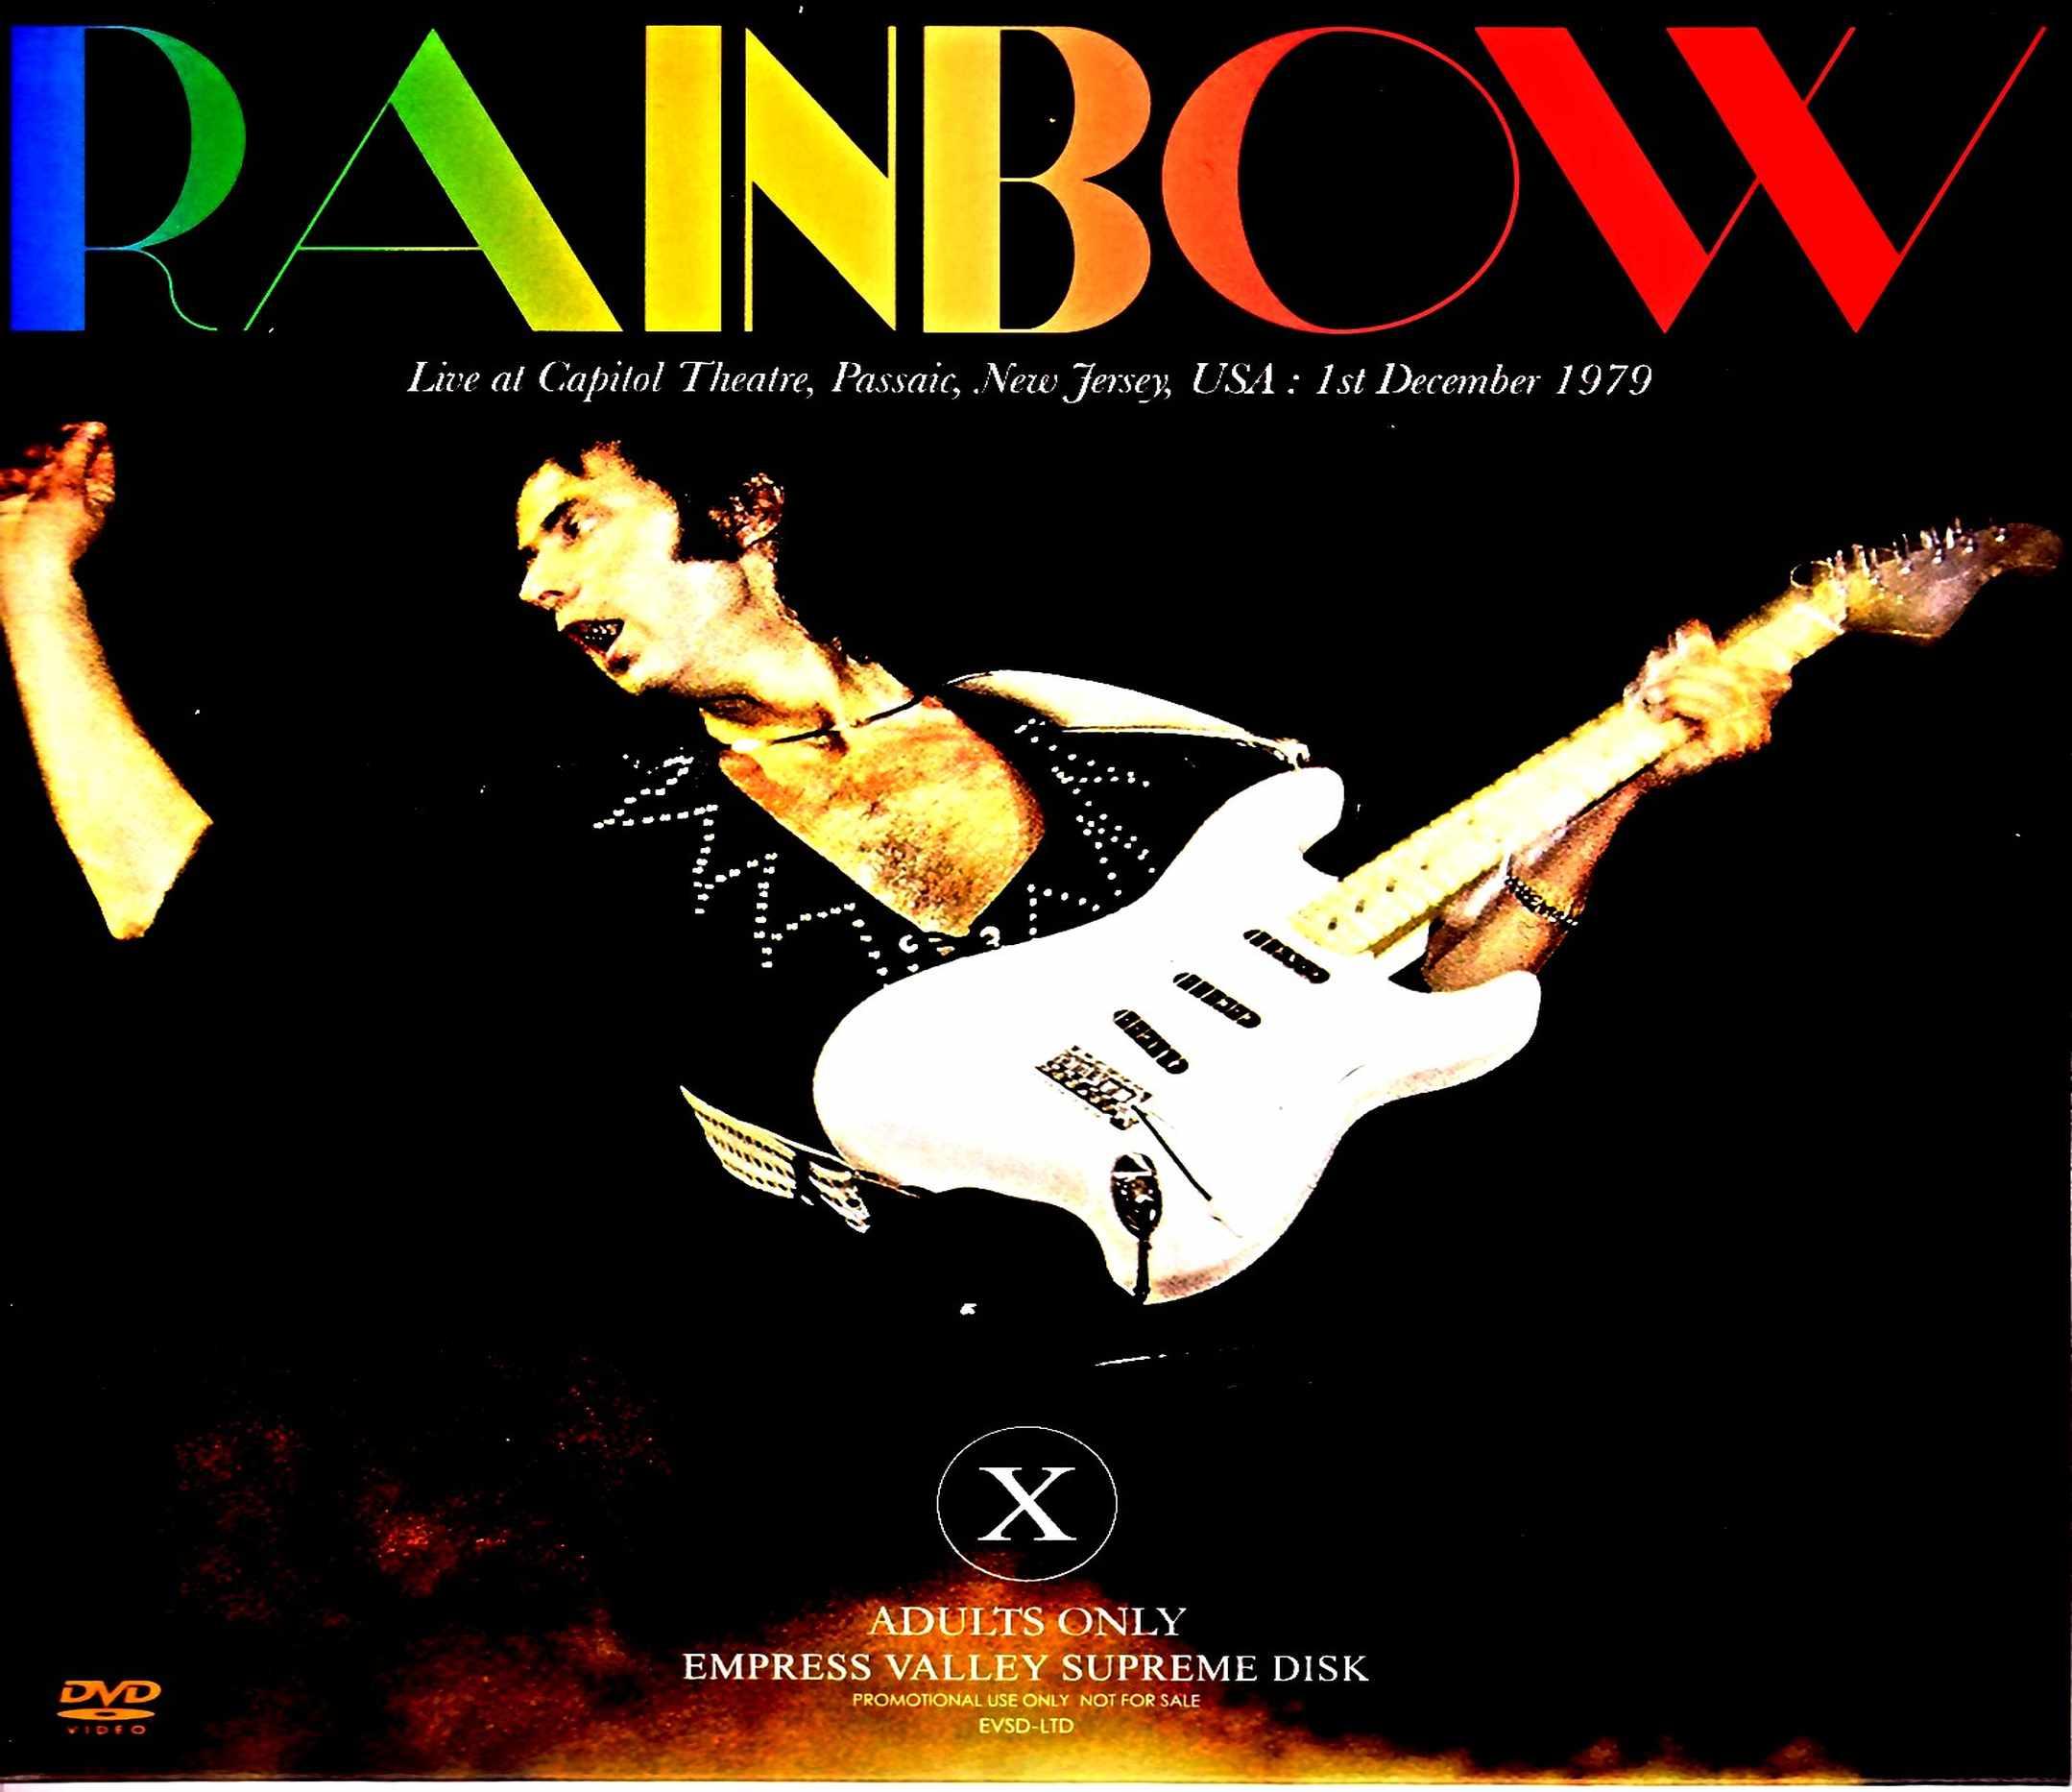 Rainbow レインボー/パセーイク公演 カラー版 NJ,USA 1979 Color Version